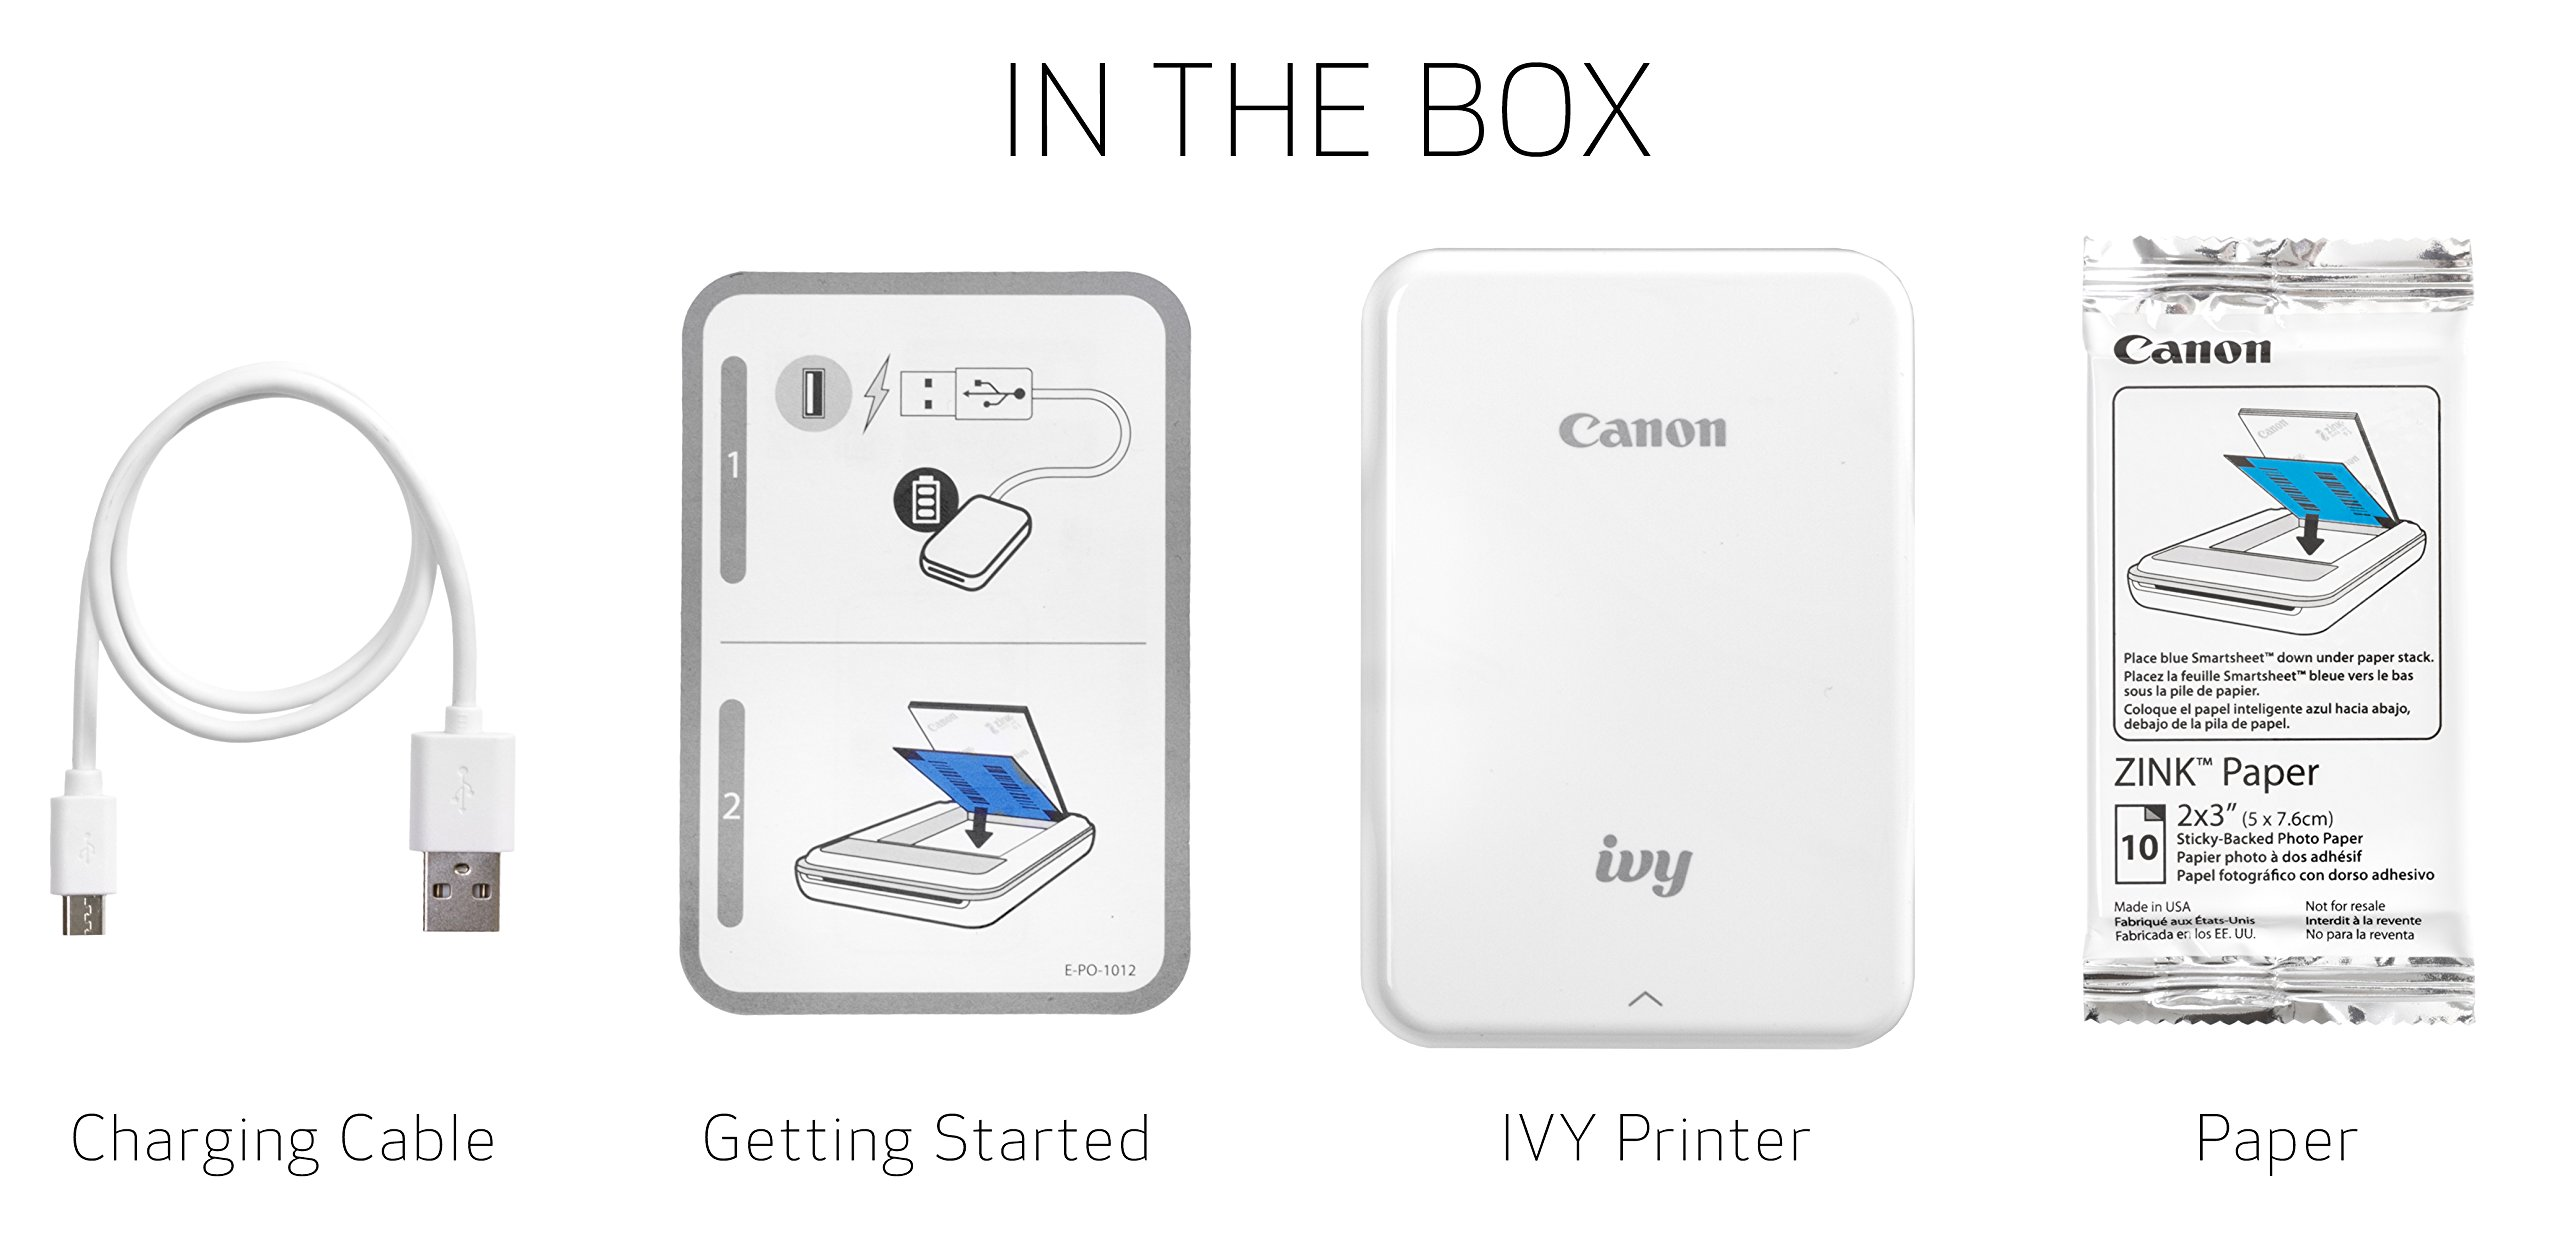 Canon IVY Mobile Mini Photo Printer through Bluetooth(R), Slate Gray by Canon (Image #5)